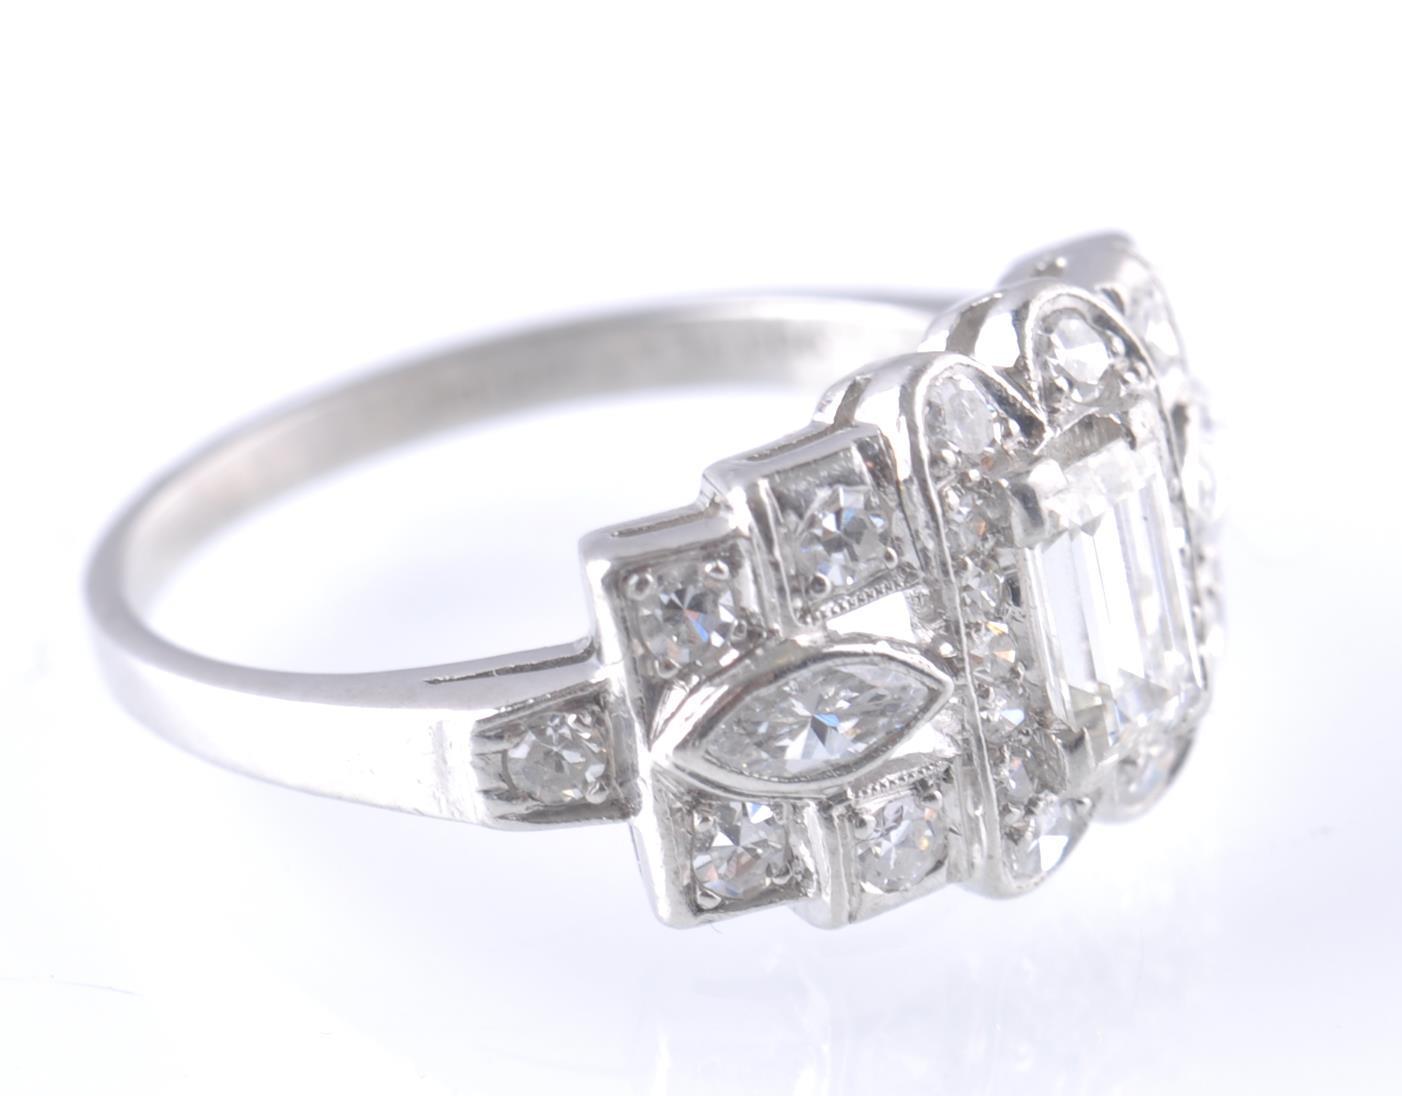 ART DECO PLATINUM AND DIAMOND RING EMERALD AND MAR